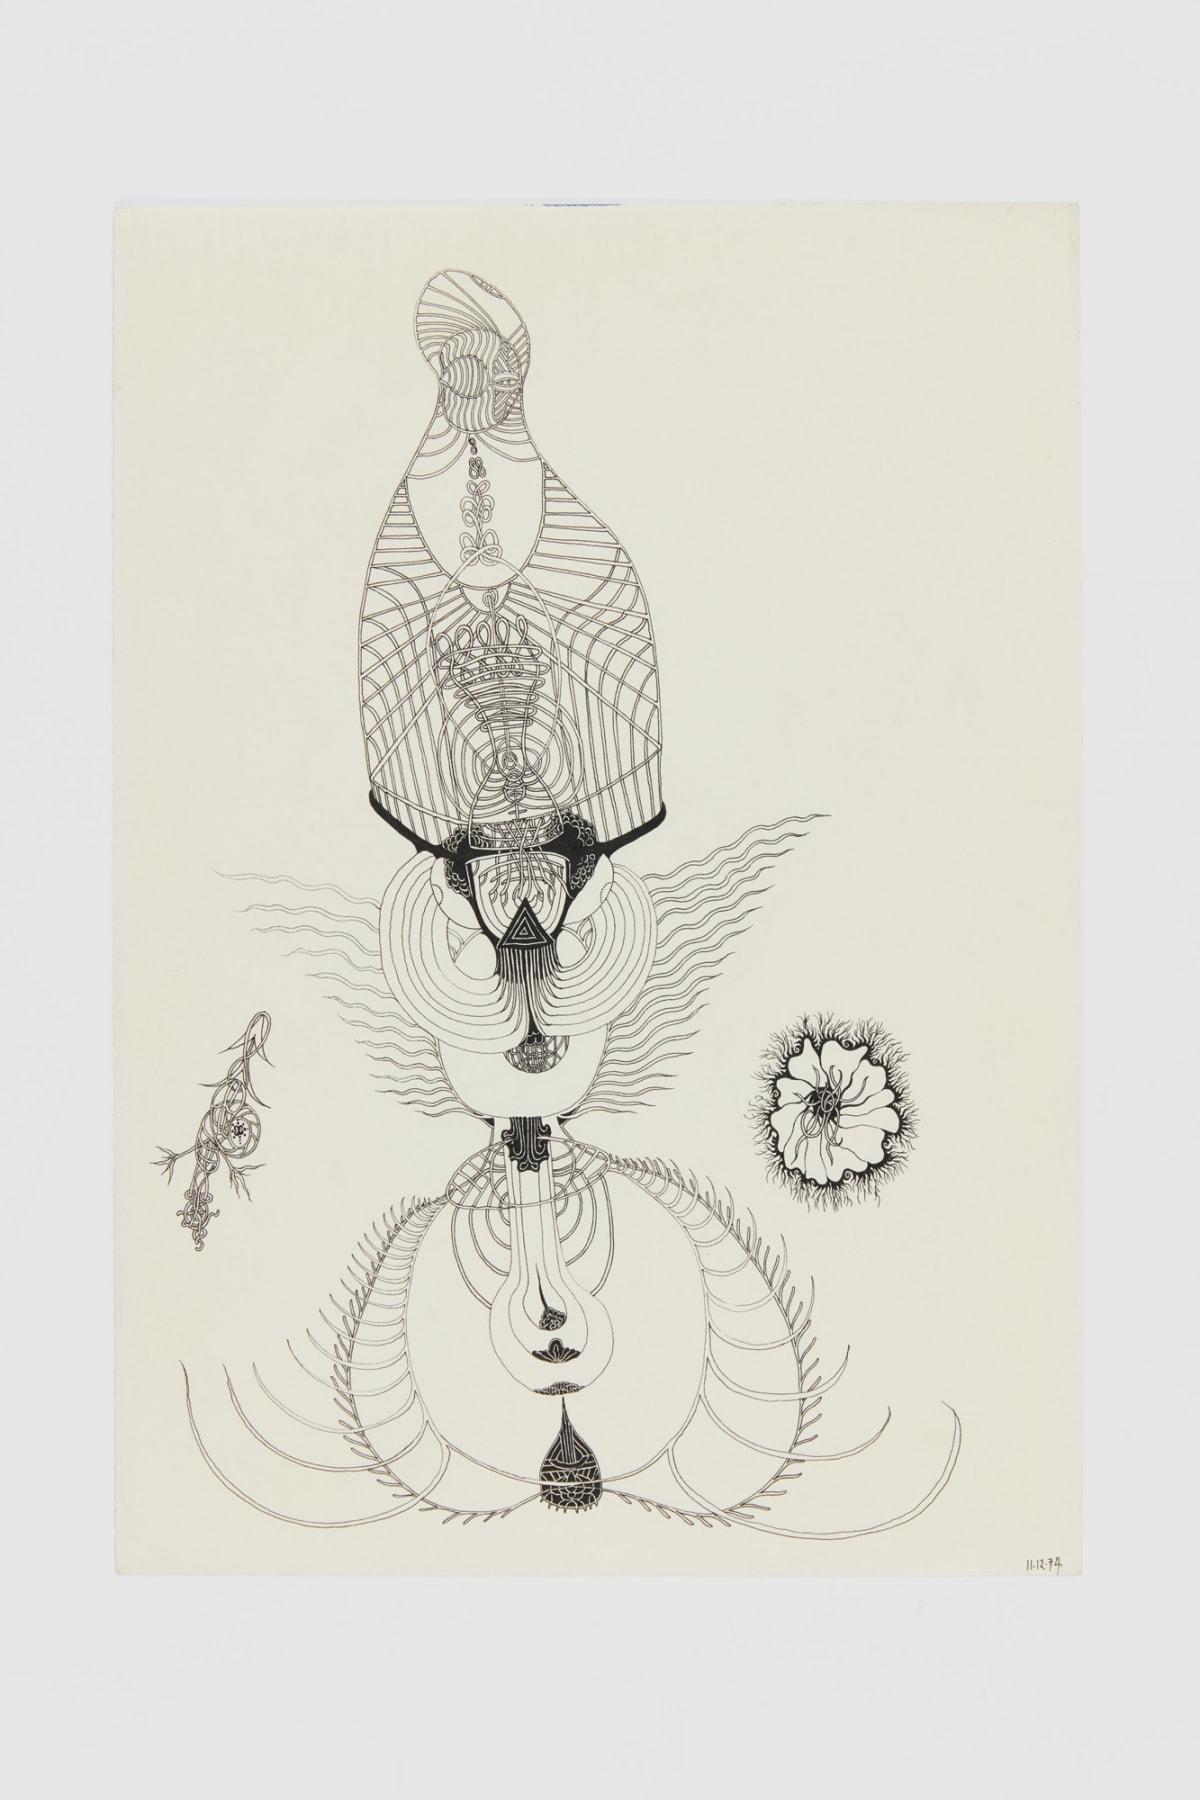 Ann CHURCHILL 11.12.74 (Daily drawings), 1974 Pen on paper 29.7 x 20.9 cm